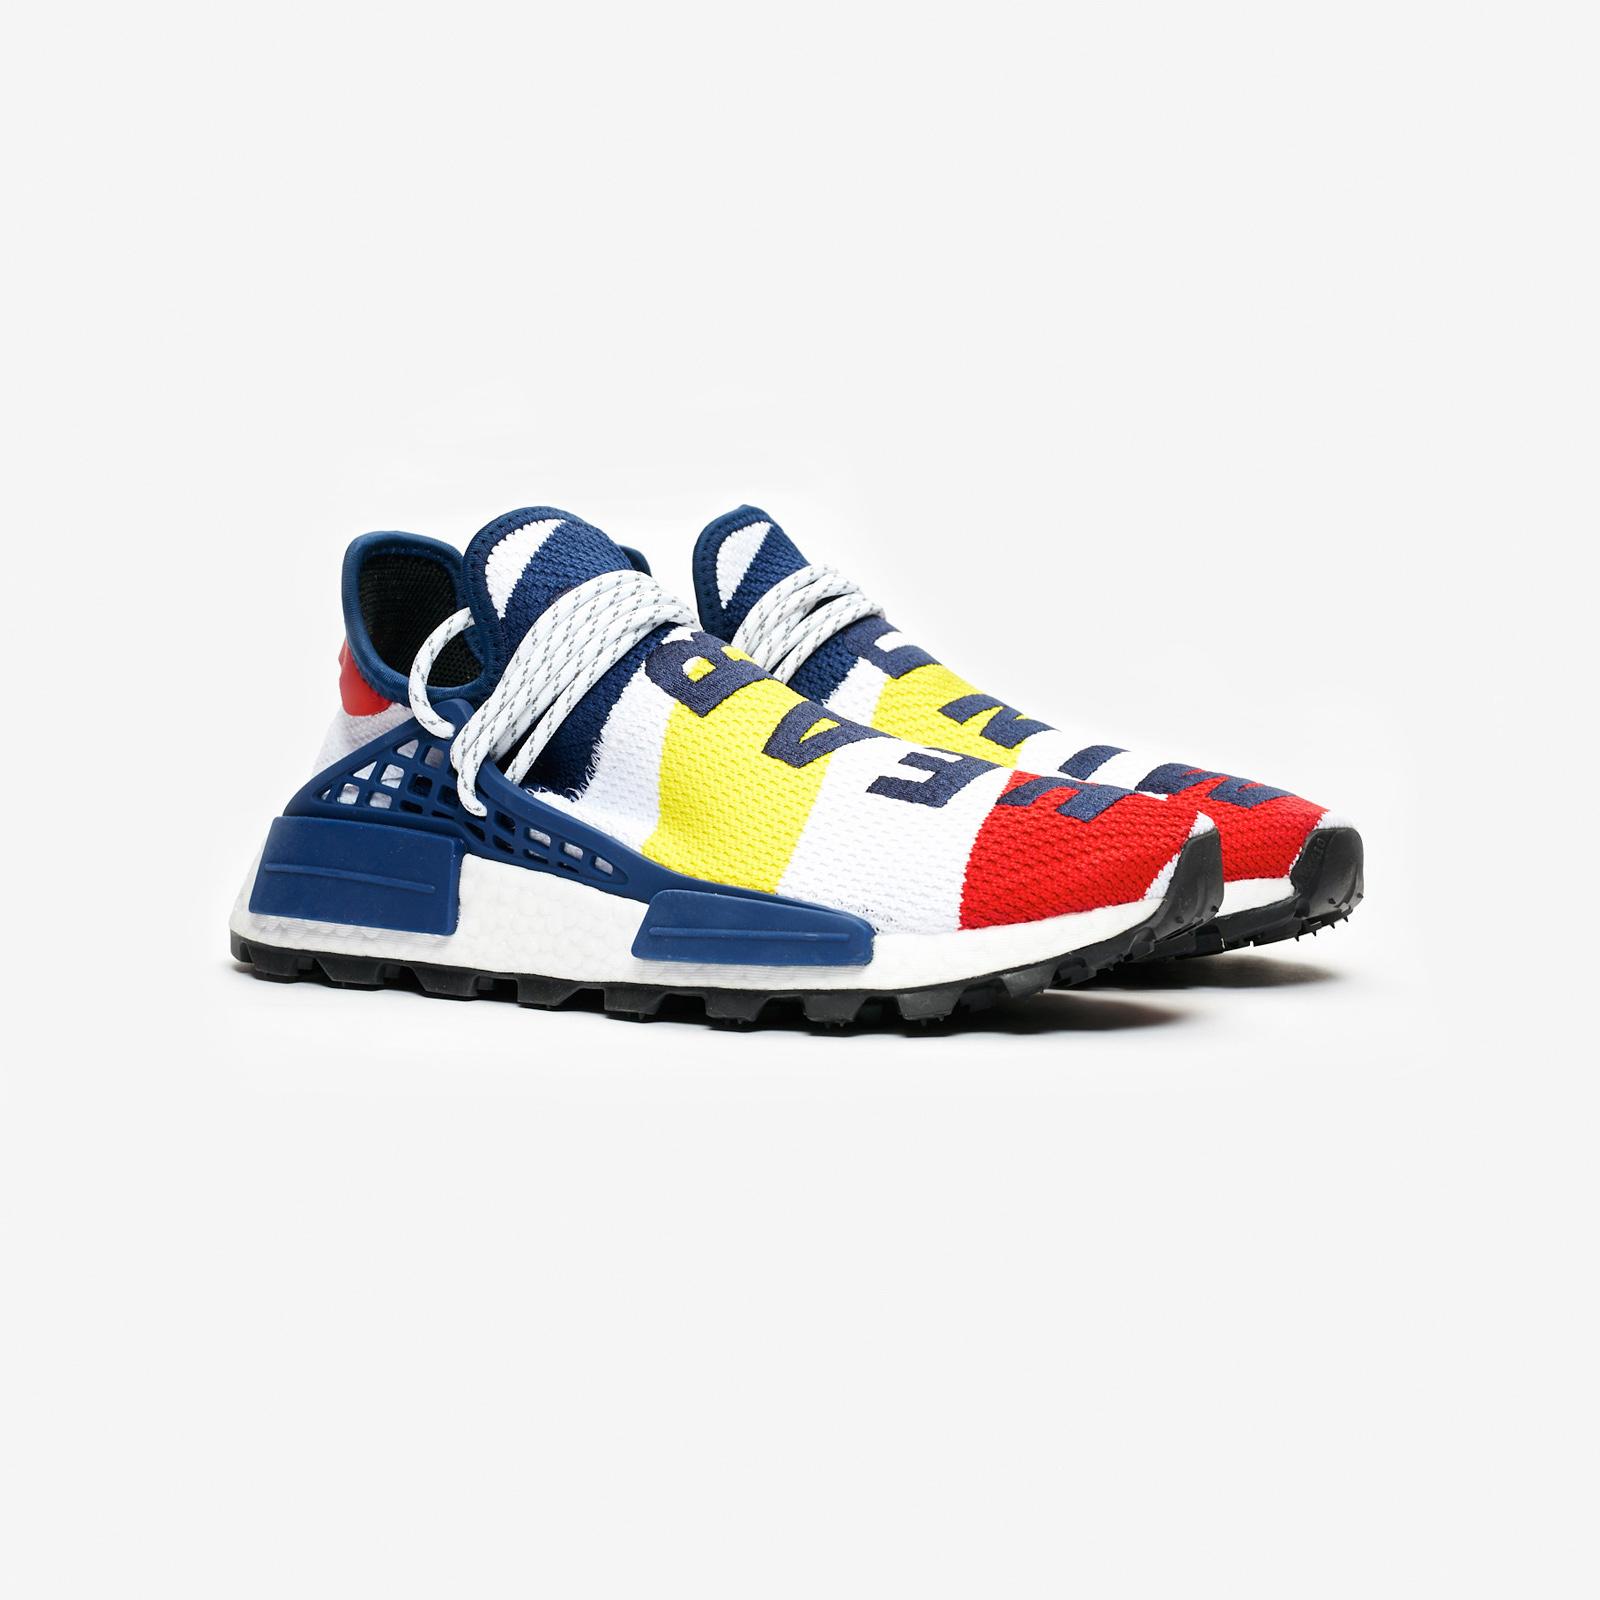 bd7e60876 adidas Hu NMD x BBC - Bb9544 - Sneakersnstuff